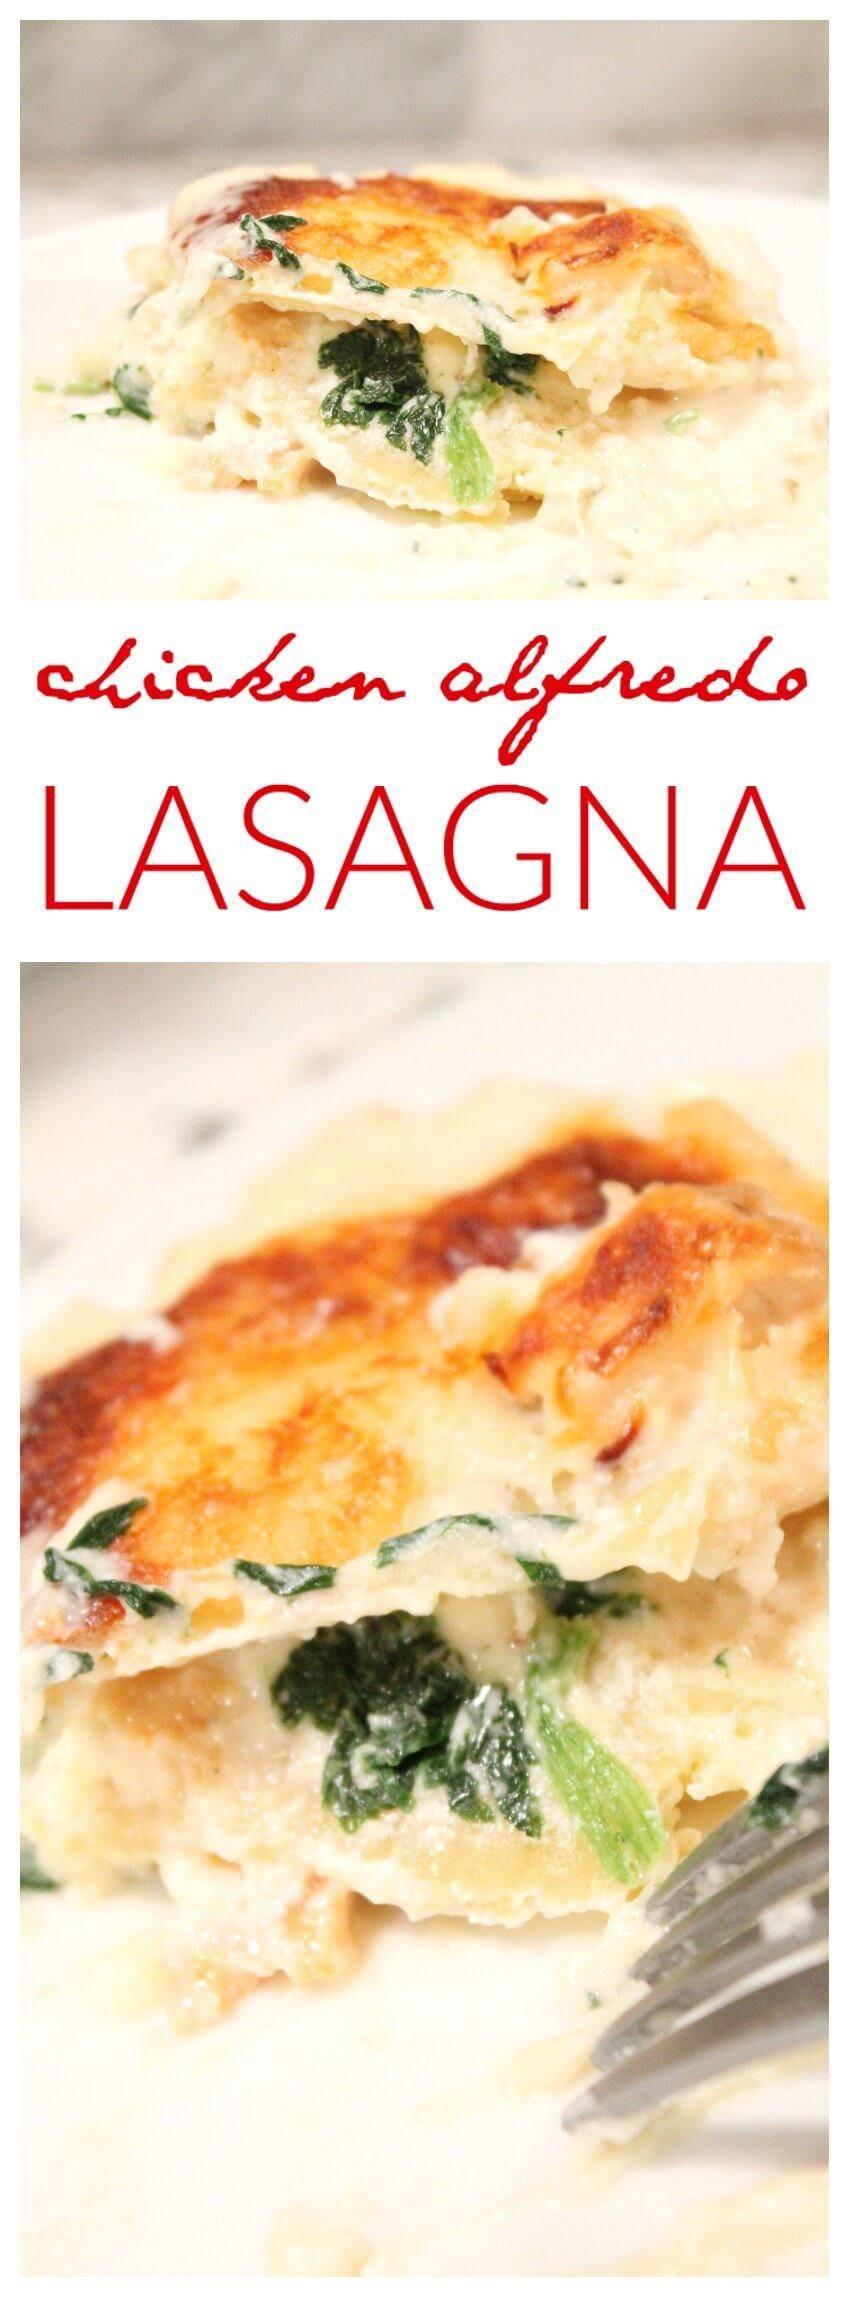 Chicken Alfredo Lasagna  Chicken Alfredo Lasagna Recipe